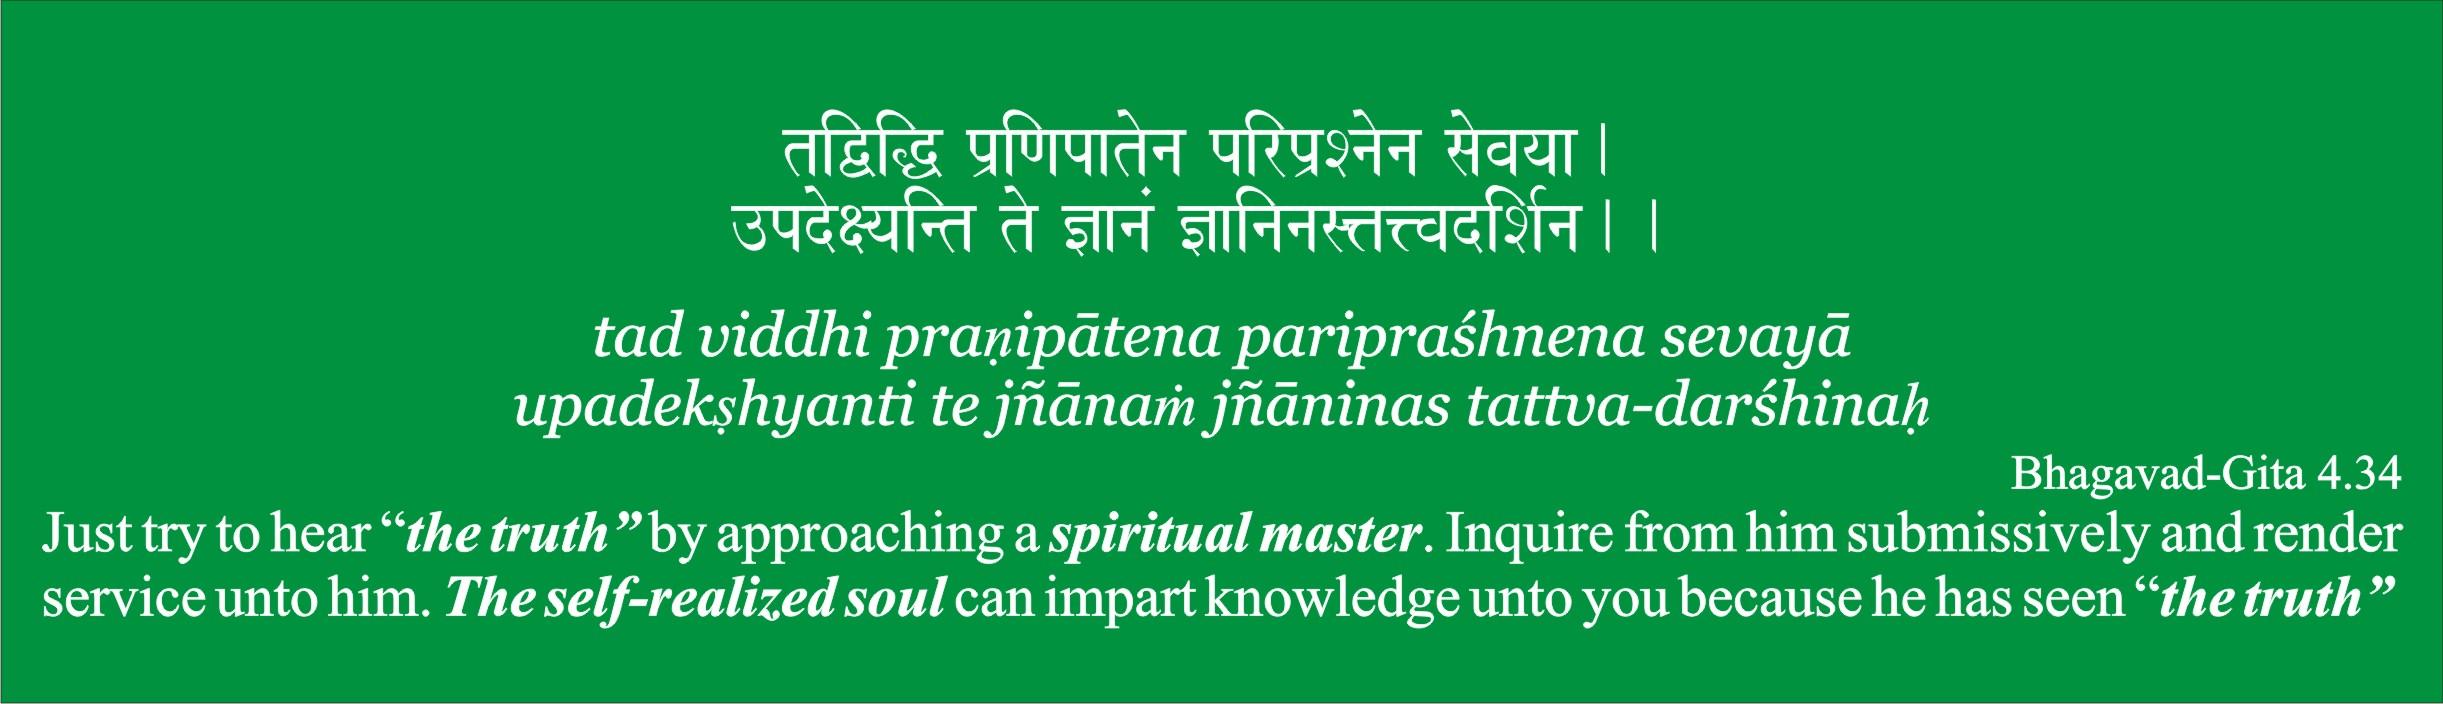 The Immortal Himalayan Master Sadguru Mahavatar Babaji – Babaji